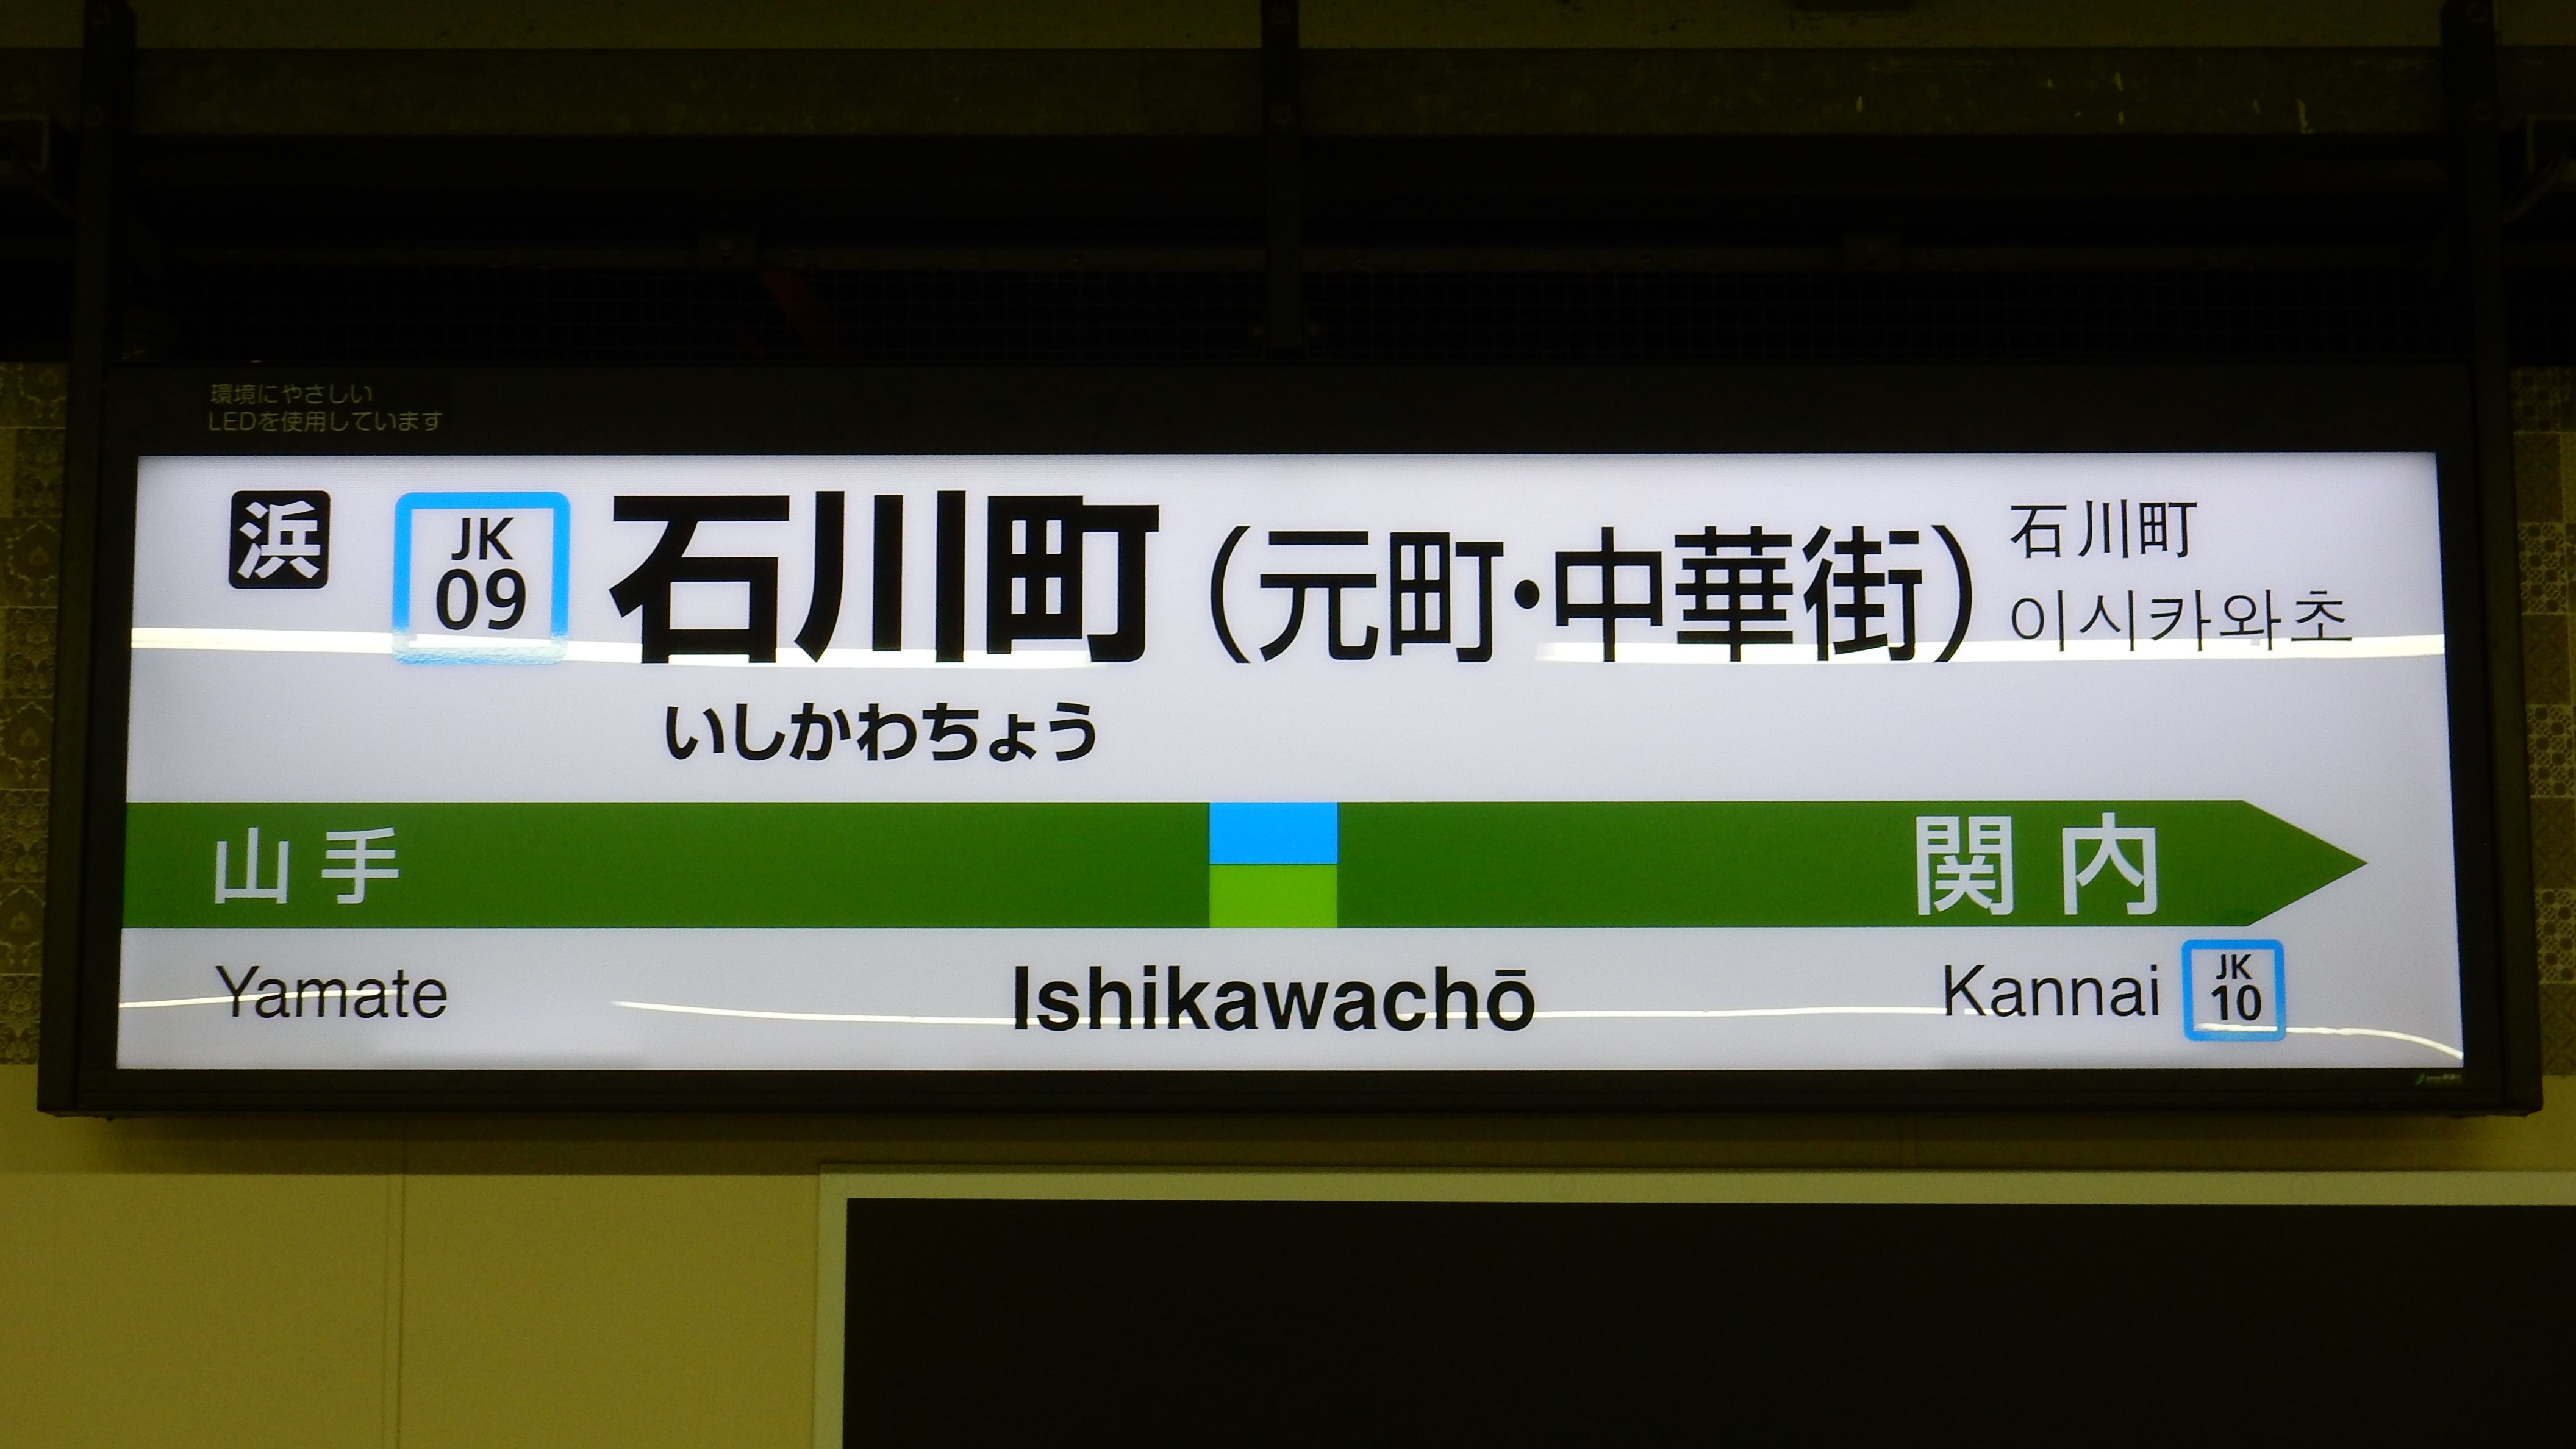 JR駅ナンバリング更新状況 17年1...